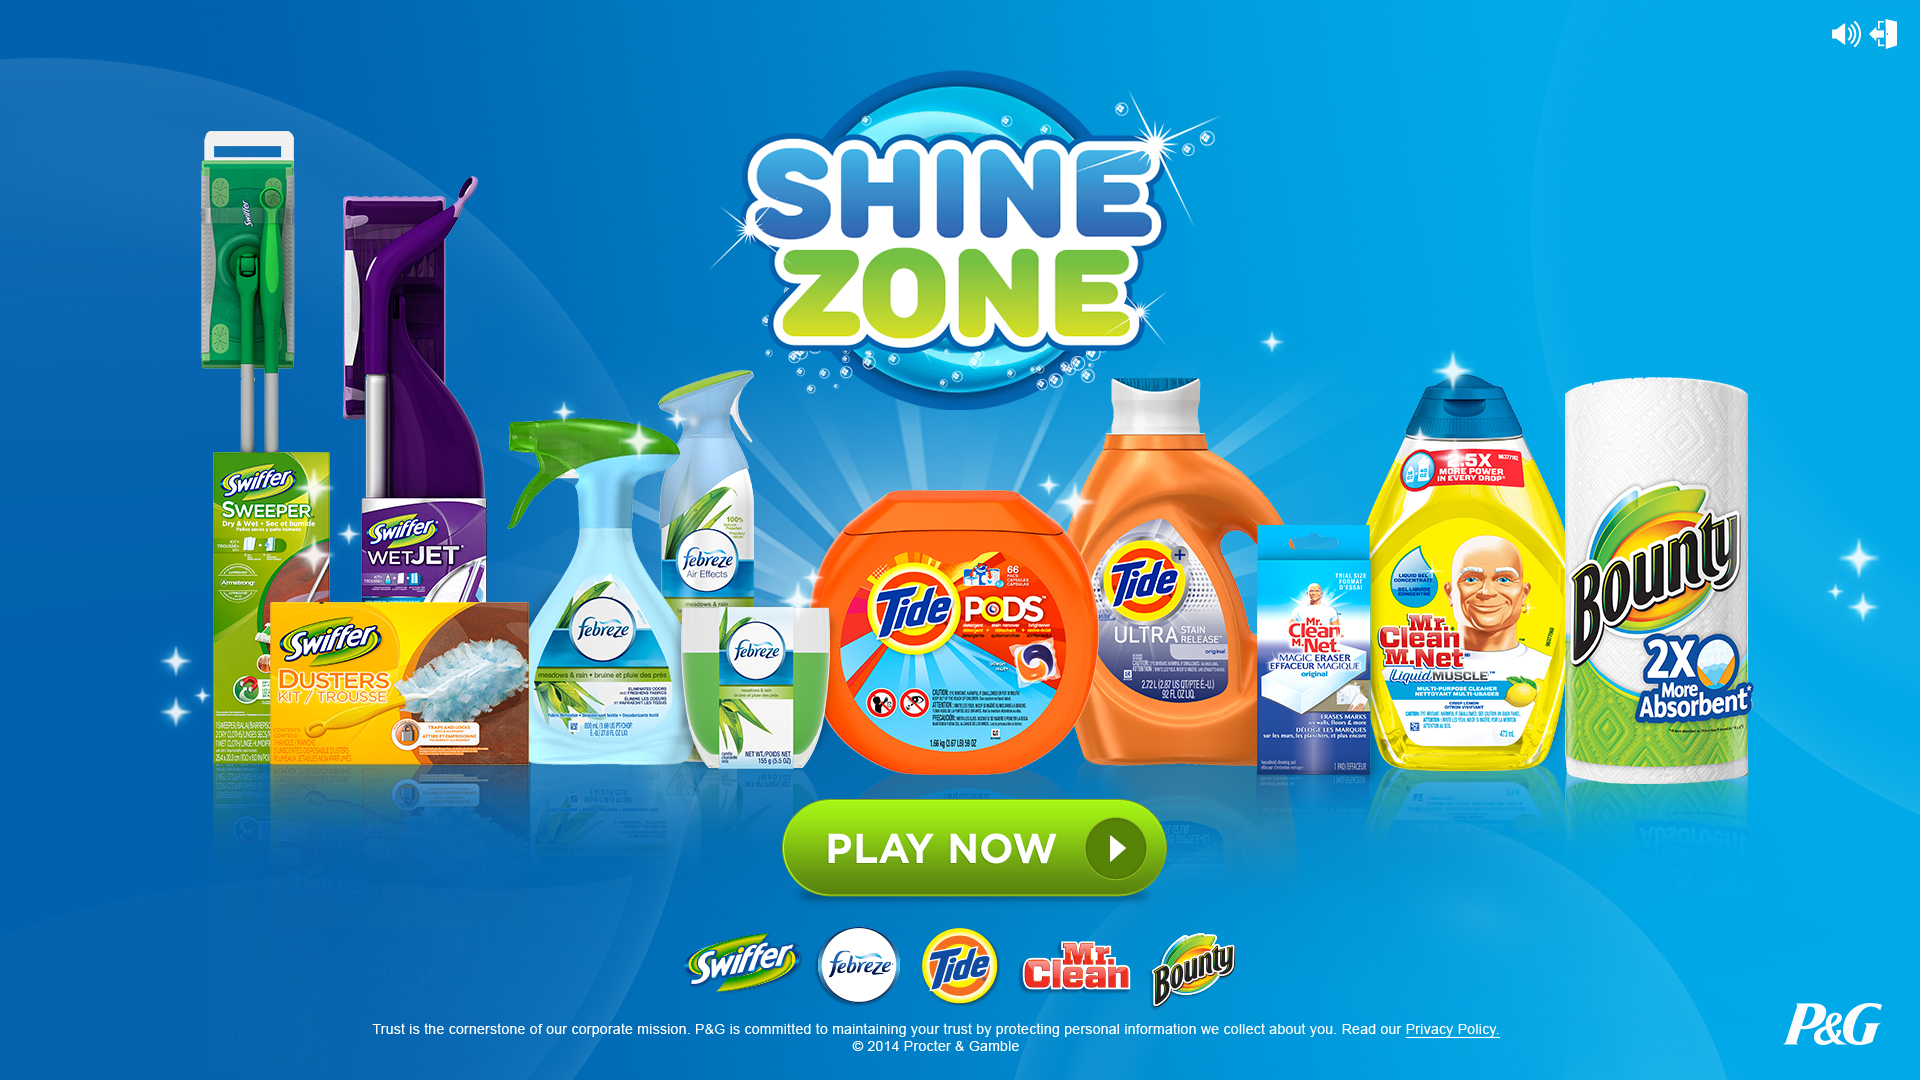 Shine zone